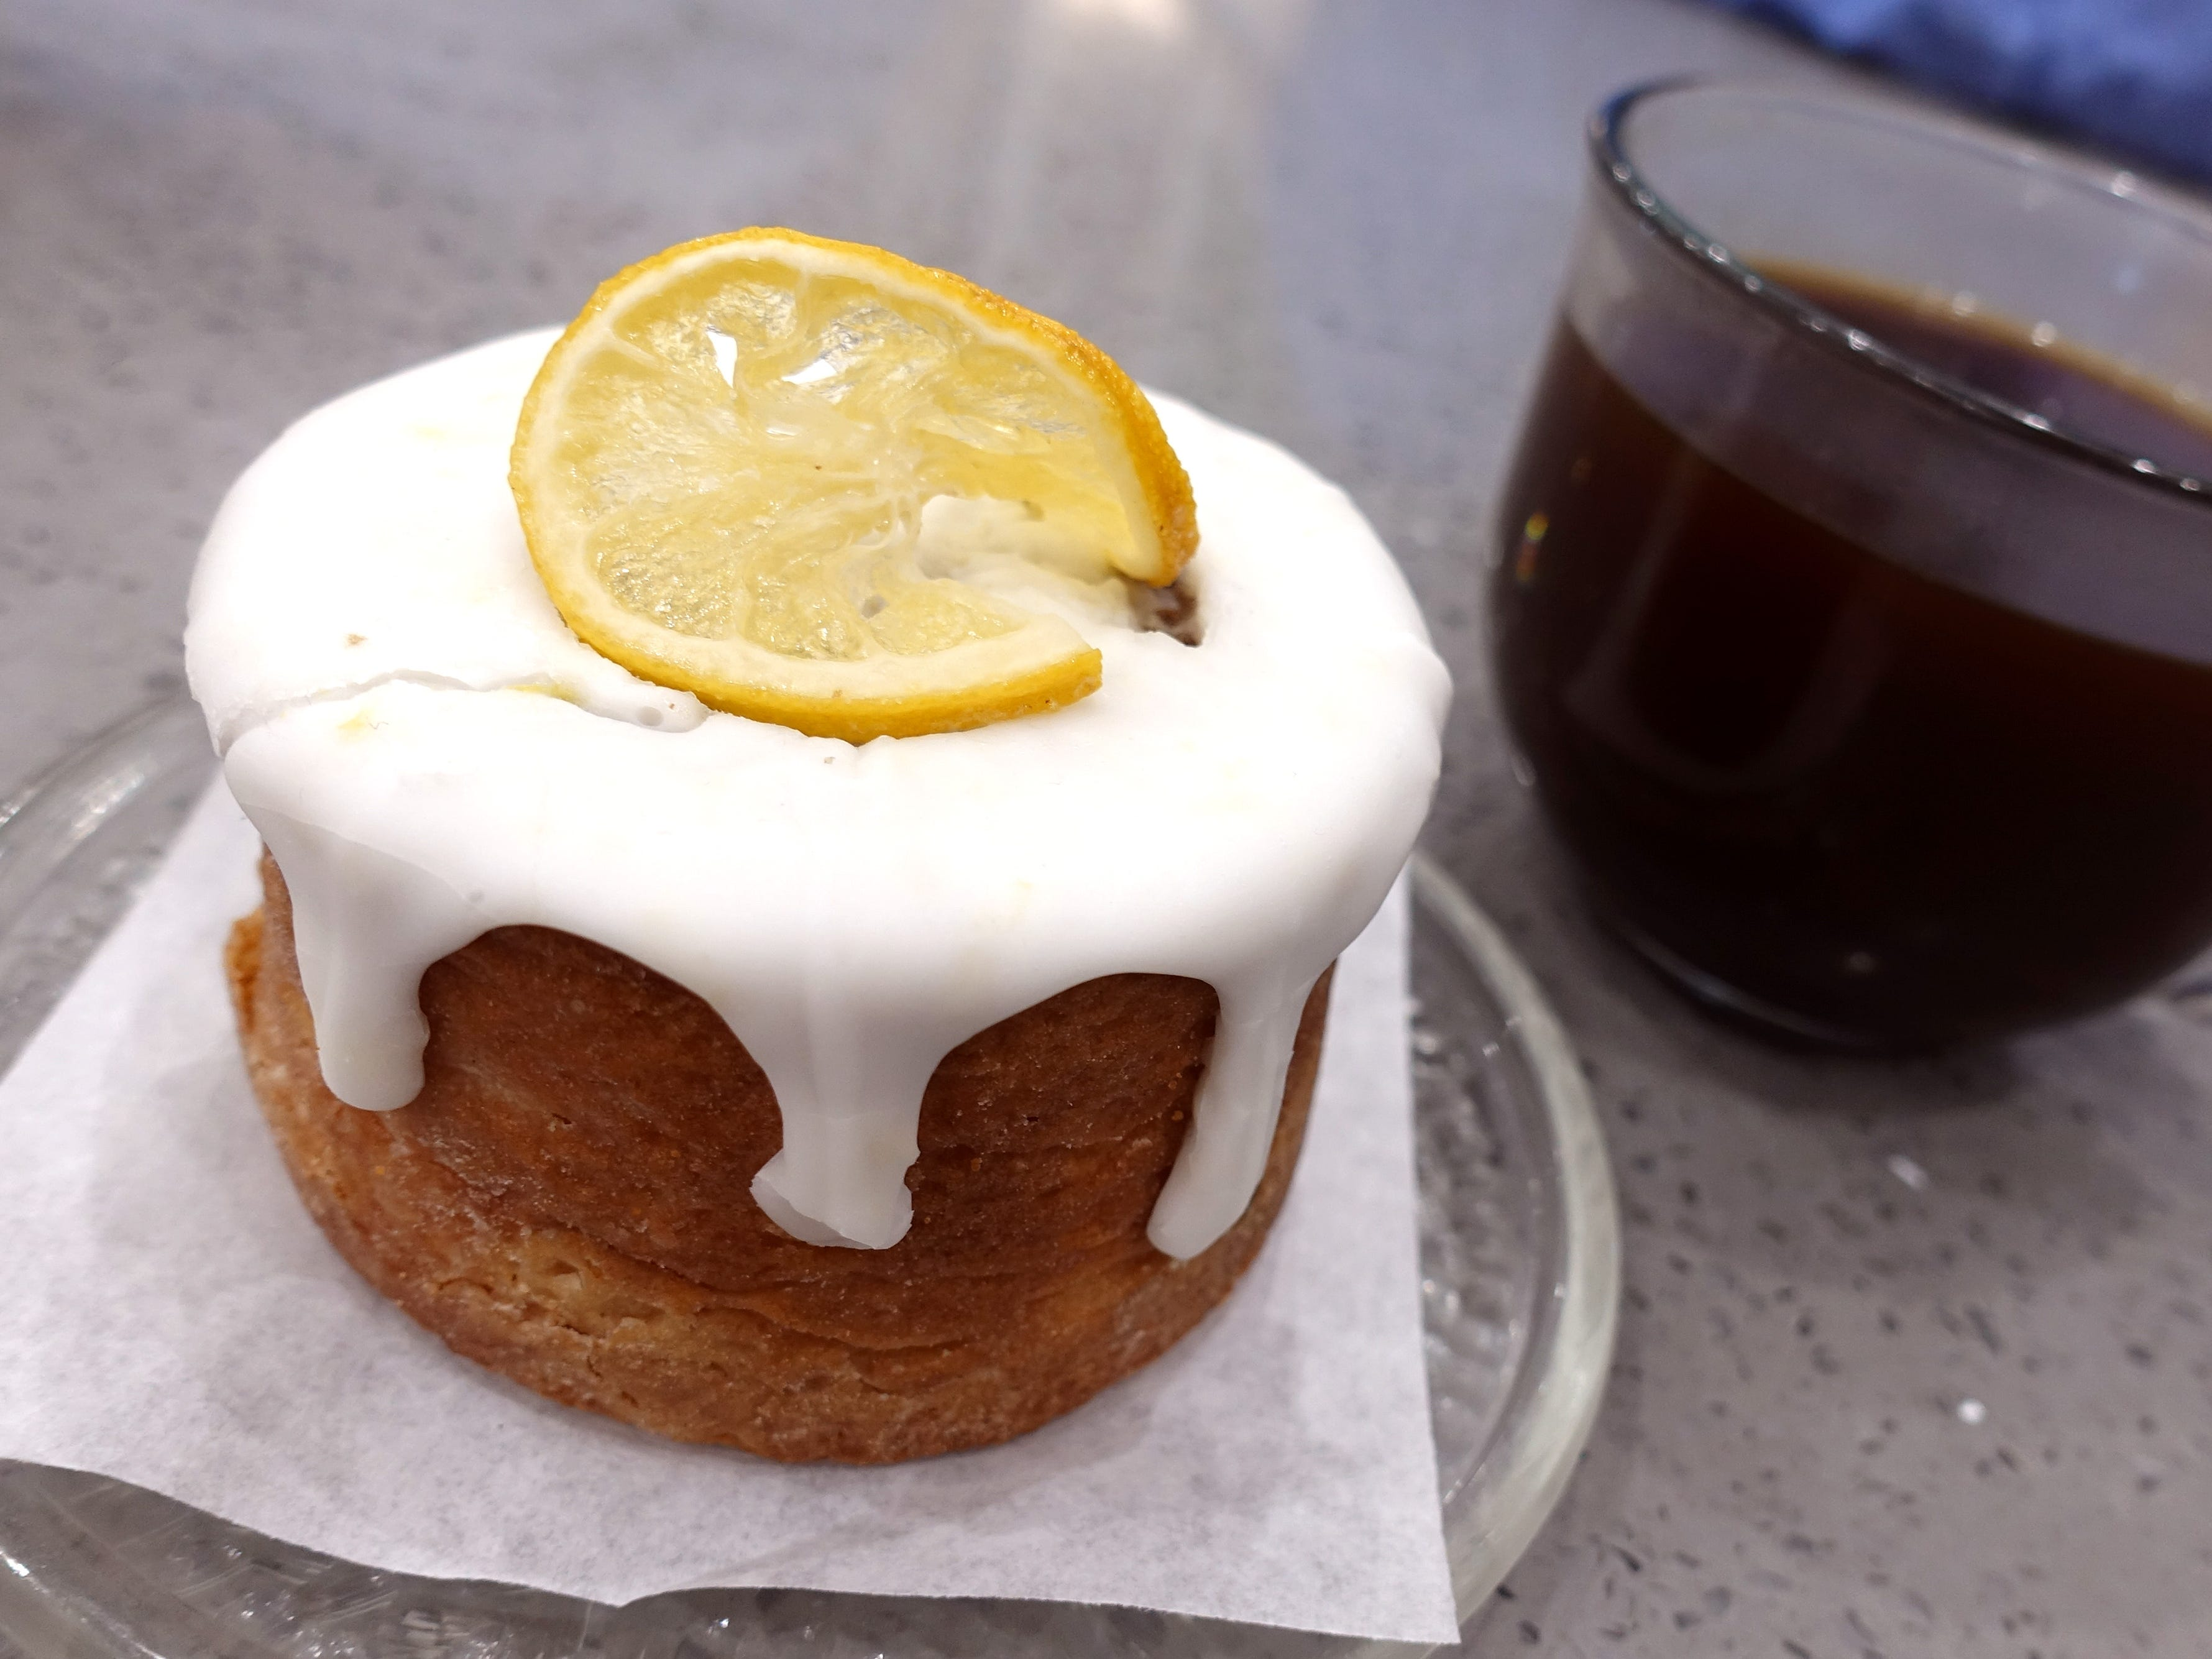 Lemon-soaked pound cake at Sweetest Season Artisan Eatery in Tempe.